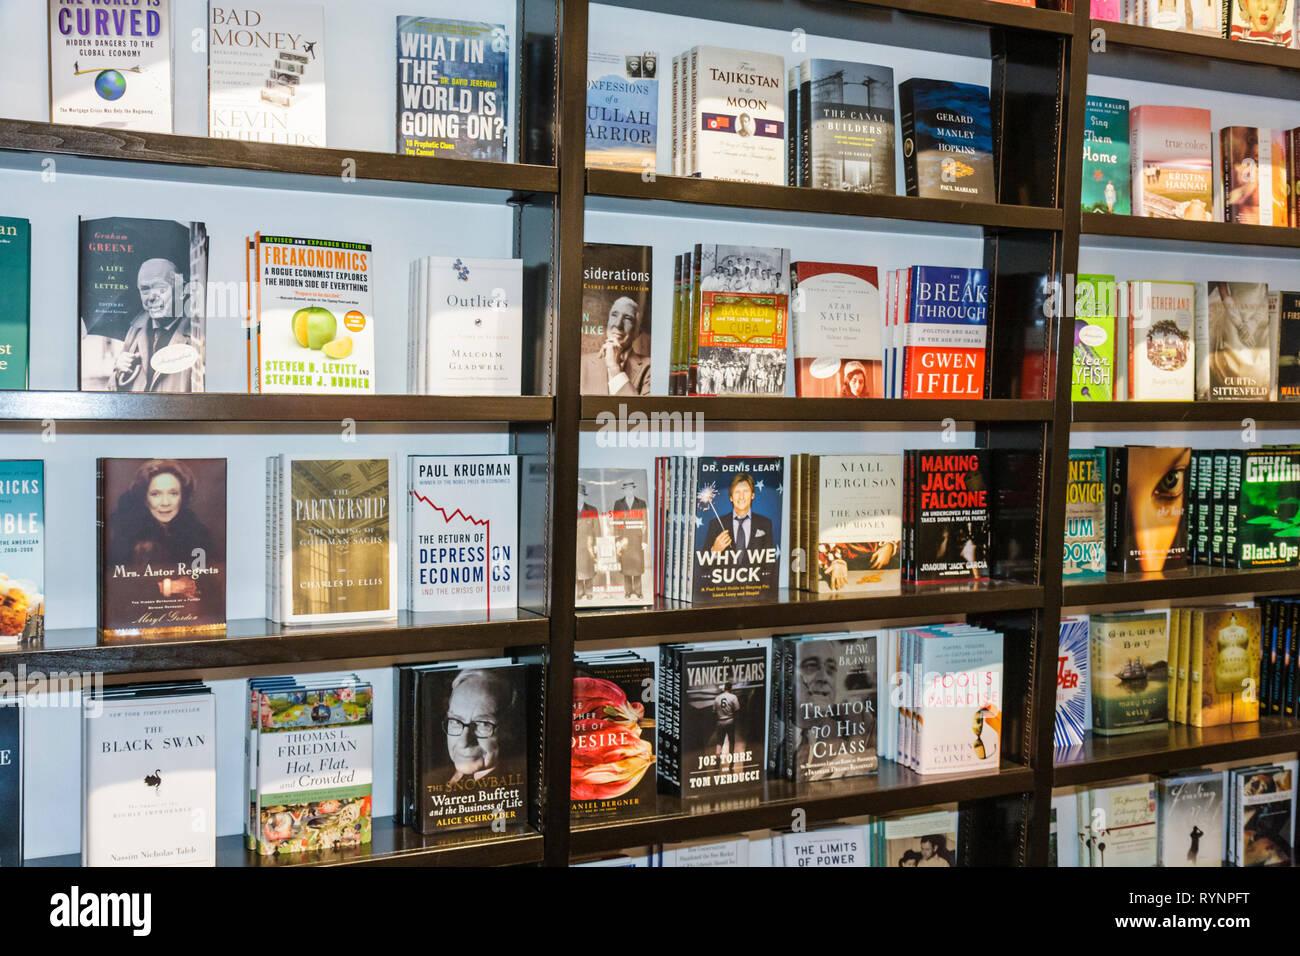 Miami Beach Florida Lincoln Road Books and Books bookstore bookshop reopening event business bookshelf topic economics economy n - Stock Image